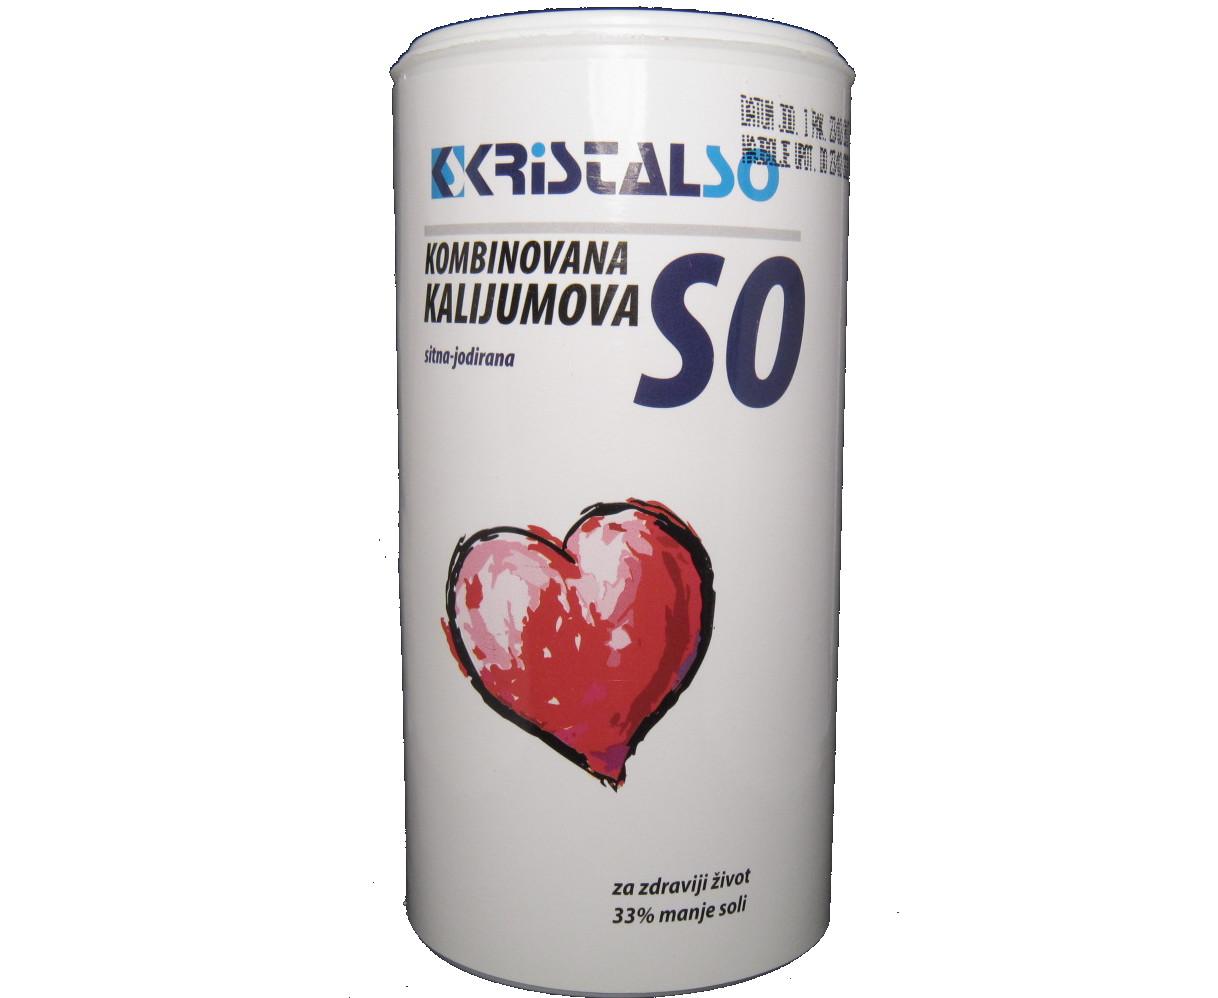 KRISTAL SO, KOMBINOVANA KALIJUMOVA SO, 350g